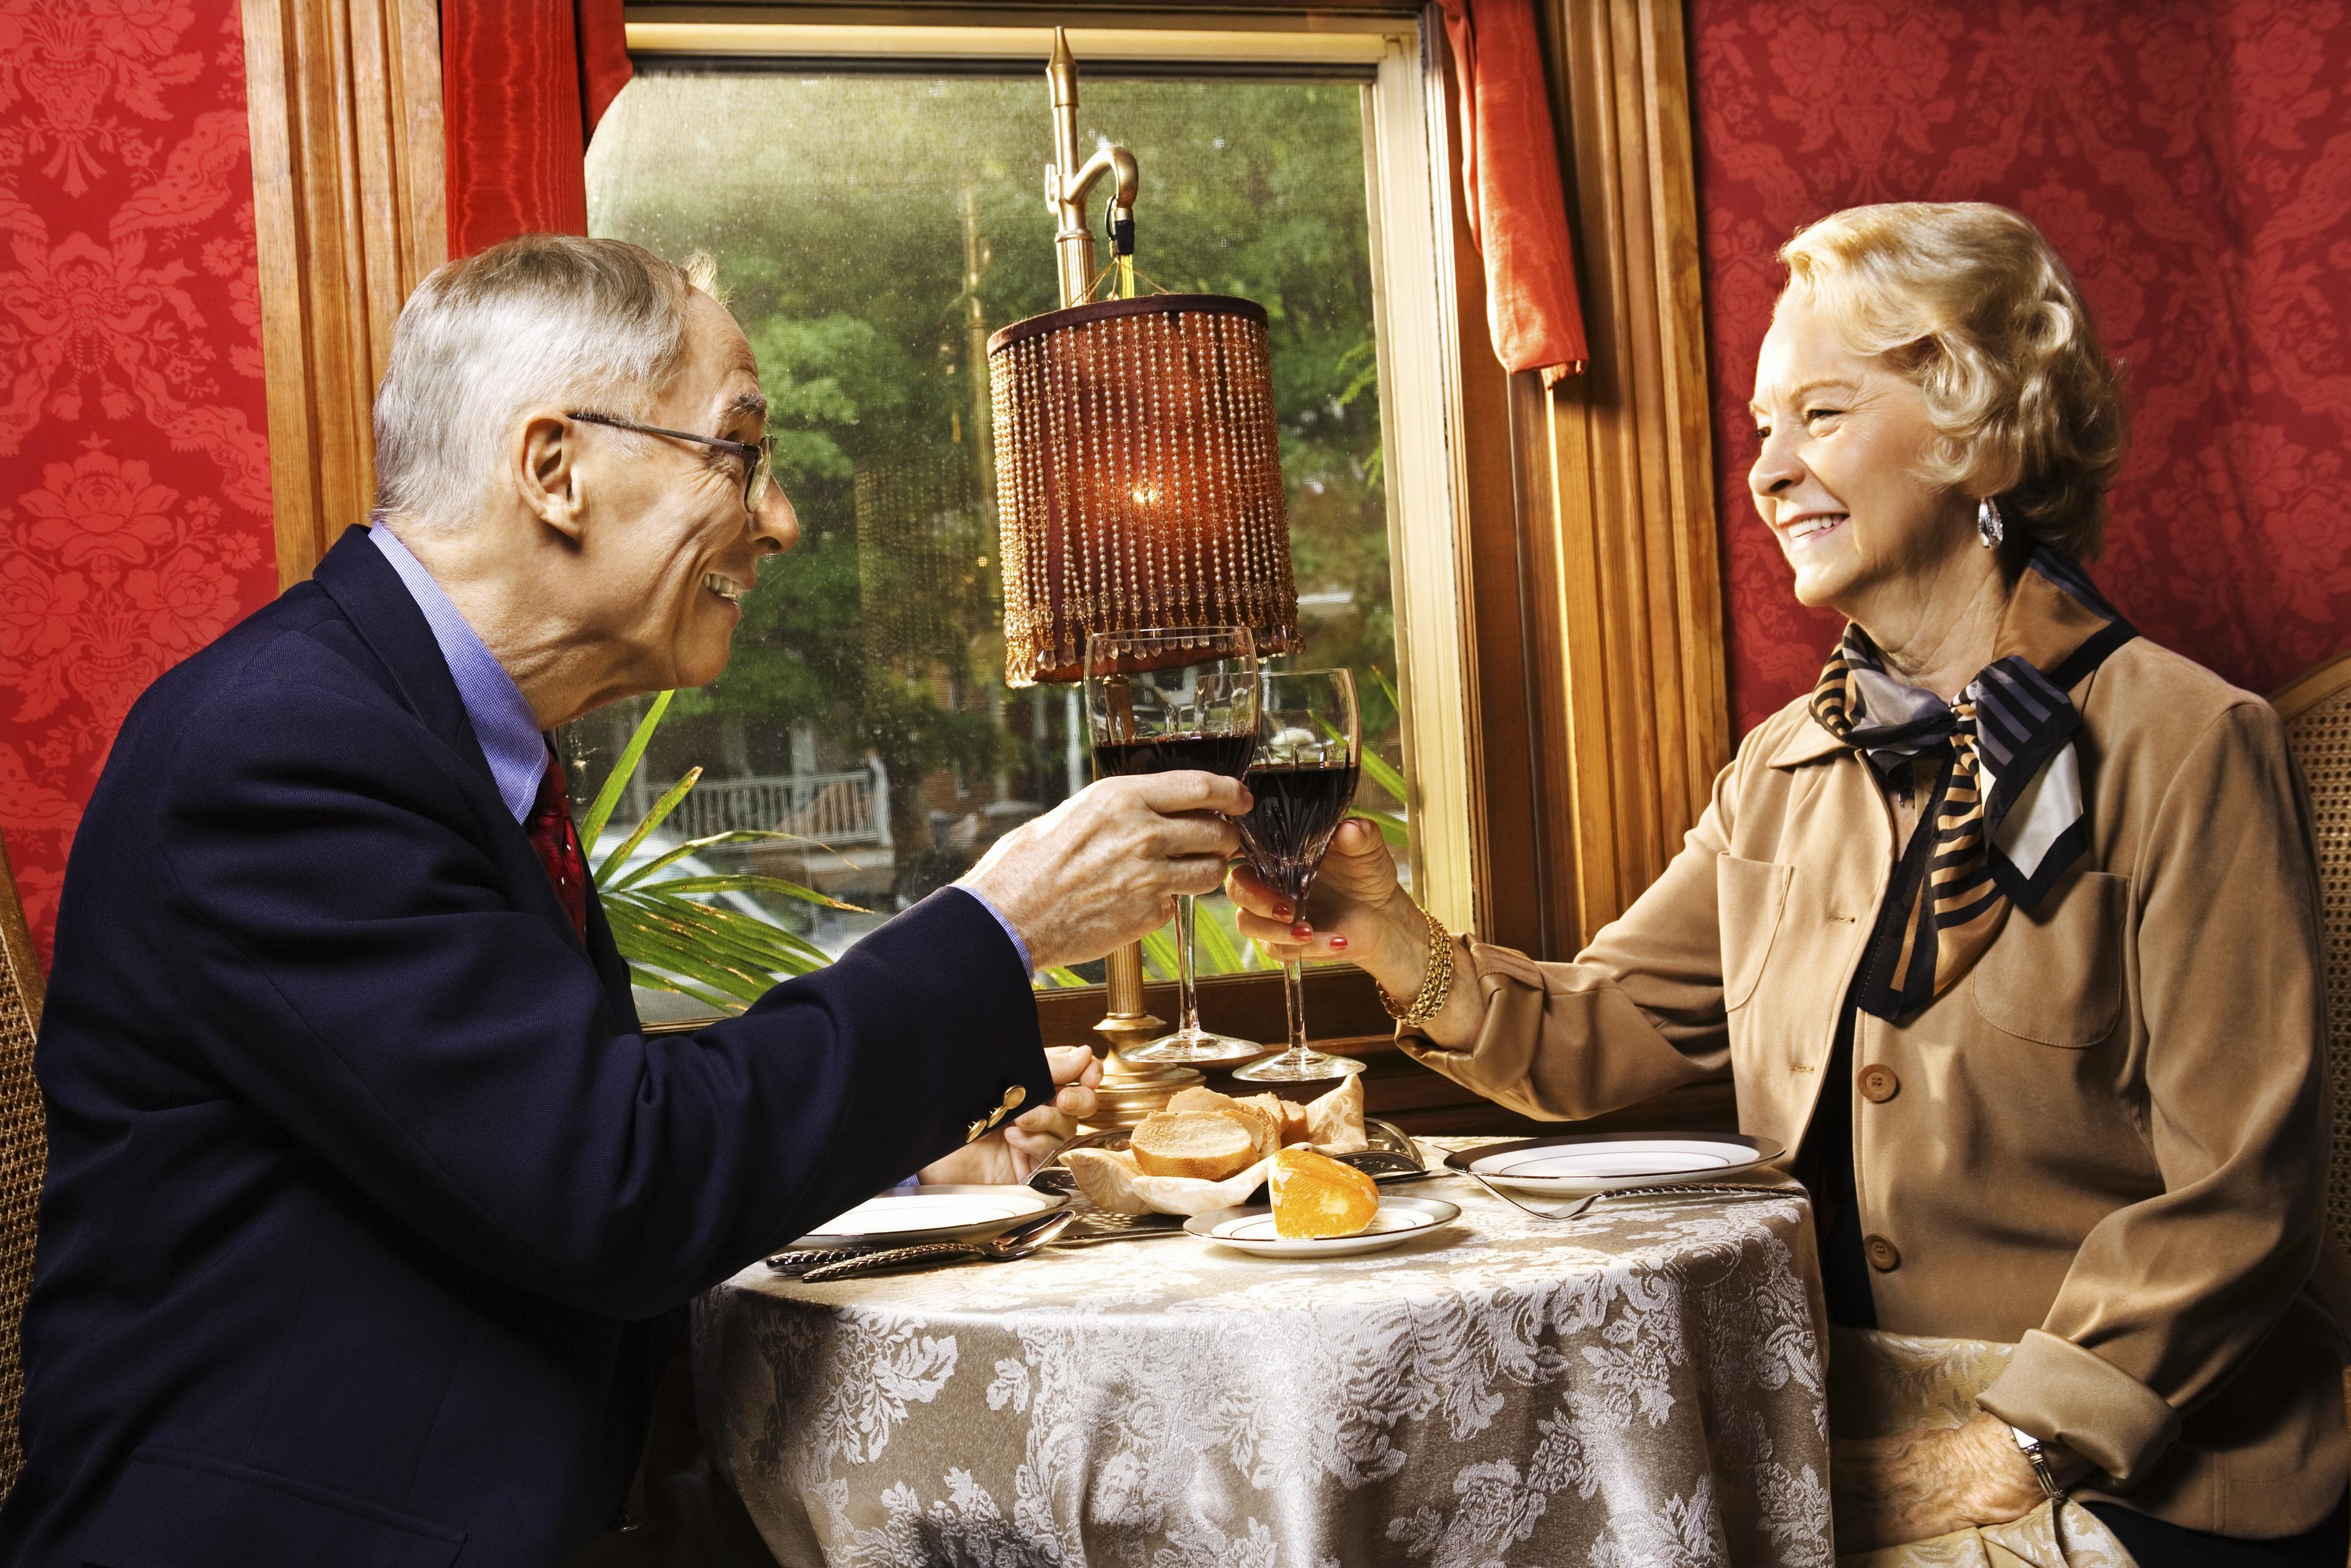 7th wedding anniversary ideas and symbols make your 50th wedding anniversary a celebration of your love buycottarizona